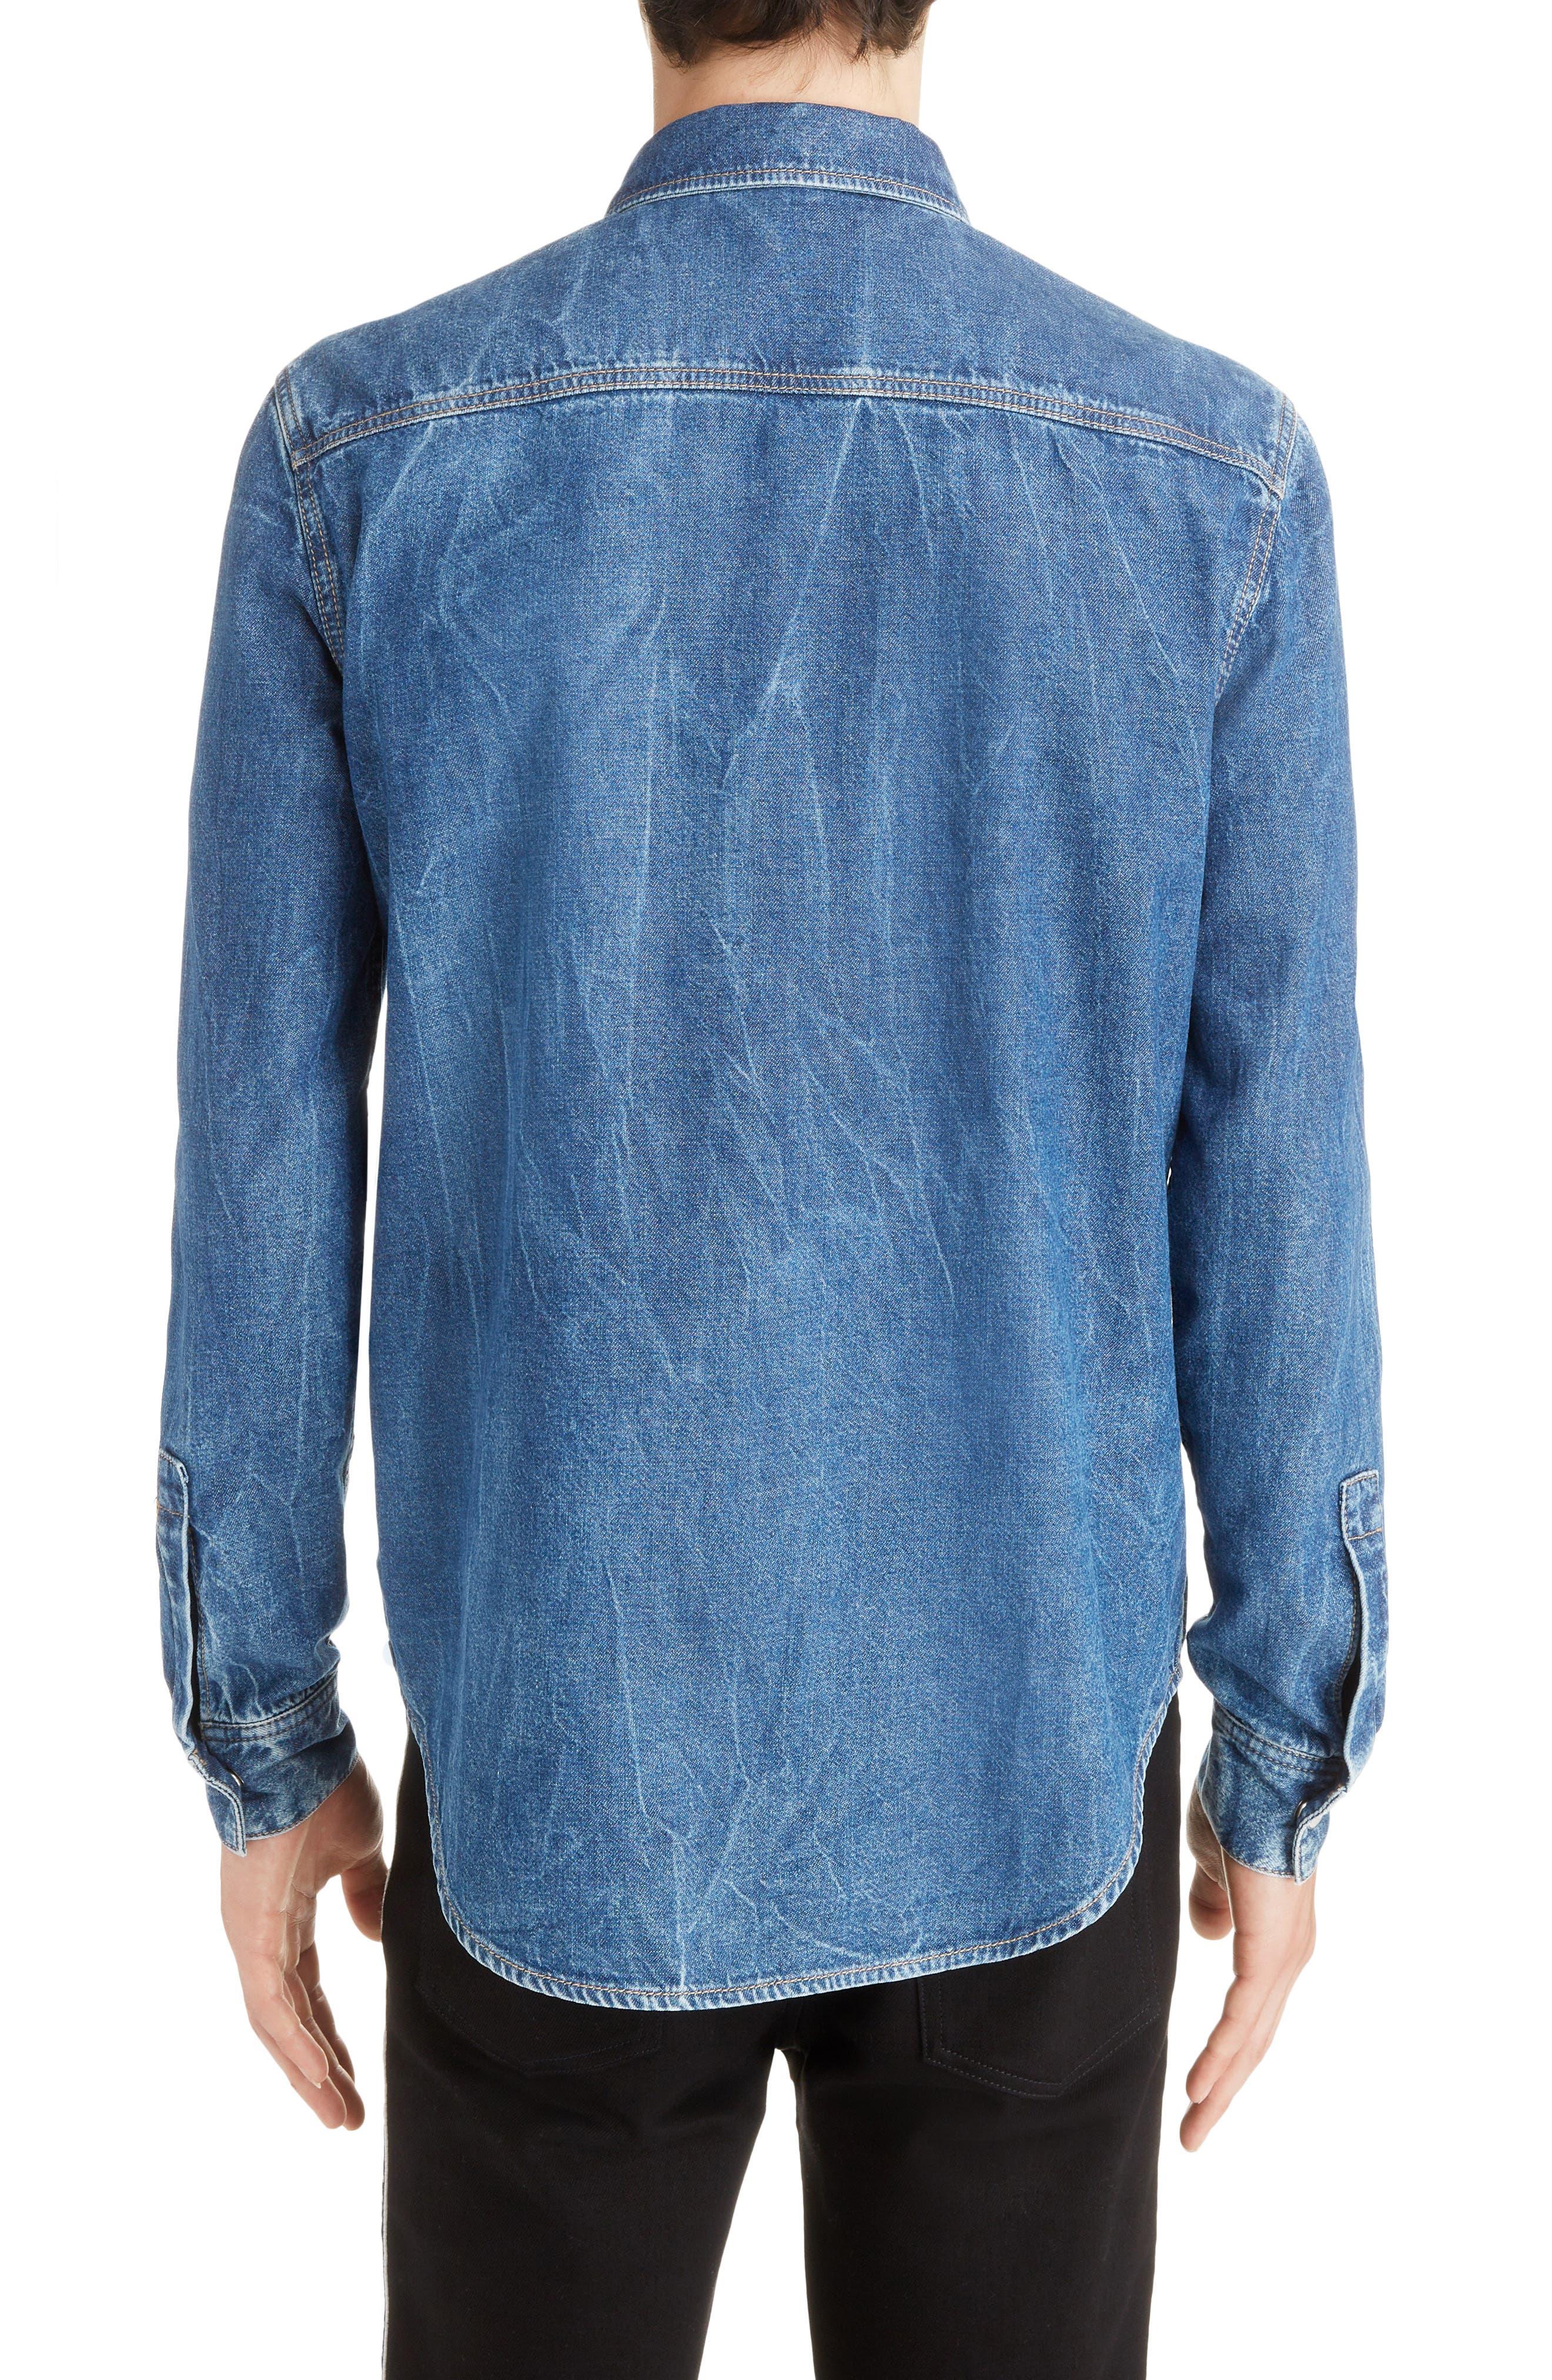 GIVENCHY,                             Denim Shirt,                             Alternate thumbnail 3, color,                             MEDIUM BLUE